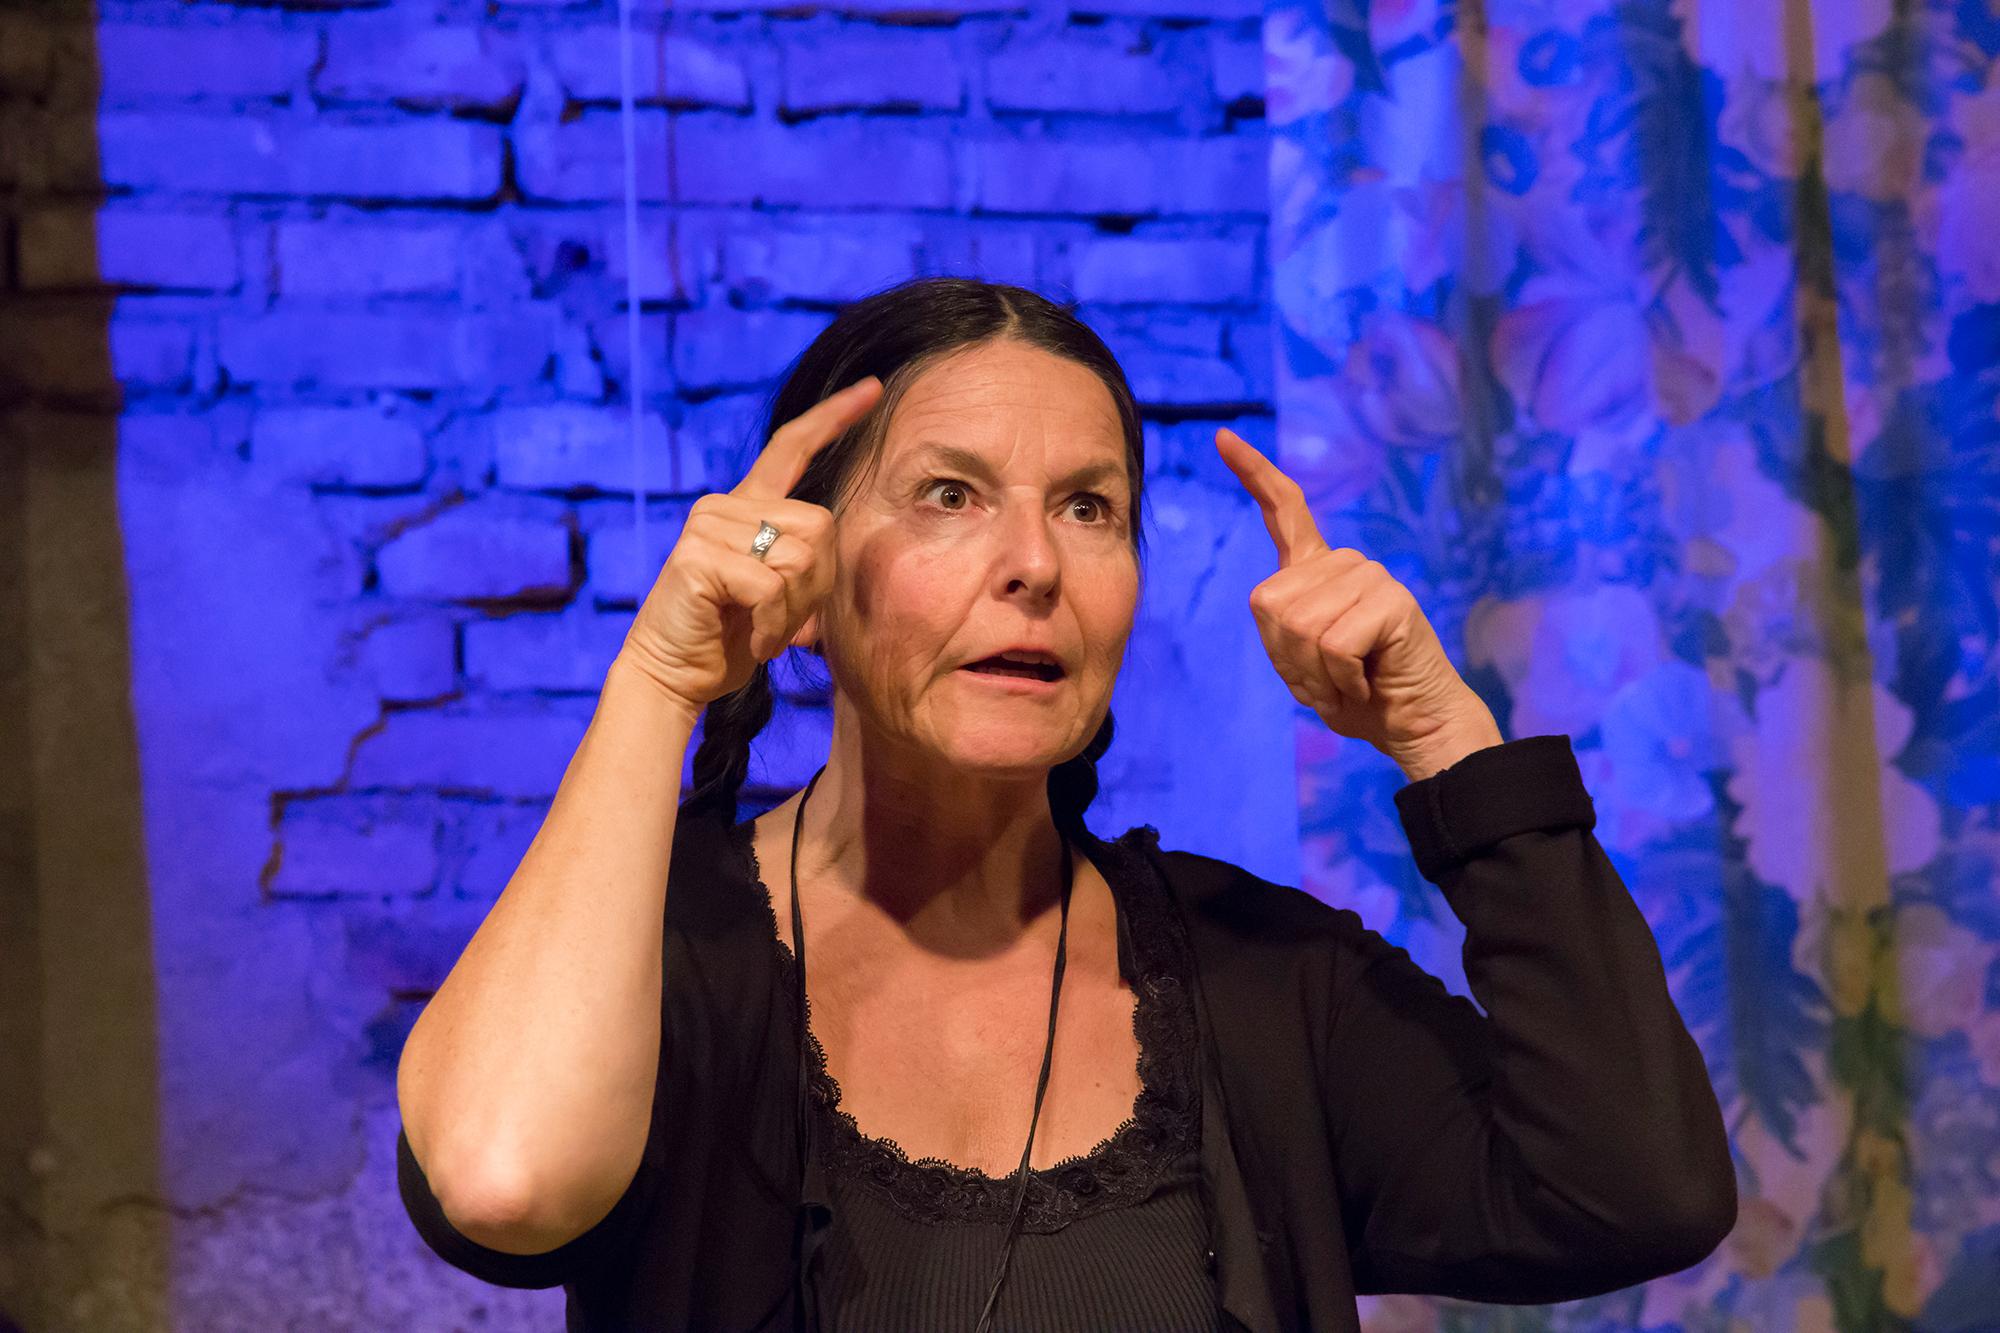 GUTE STUBE WUNSCHKONZERT | Katharina Ritter